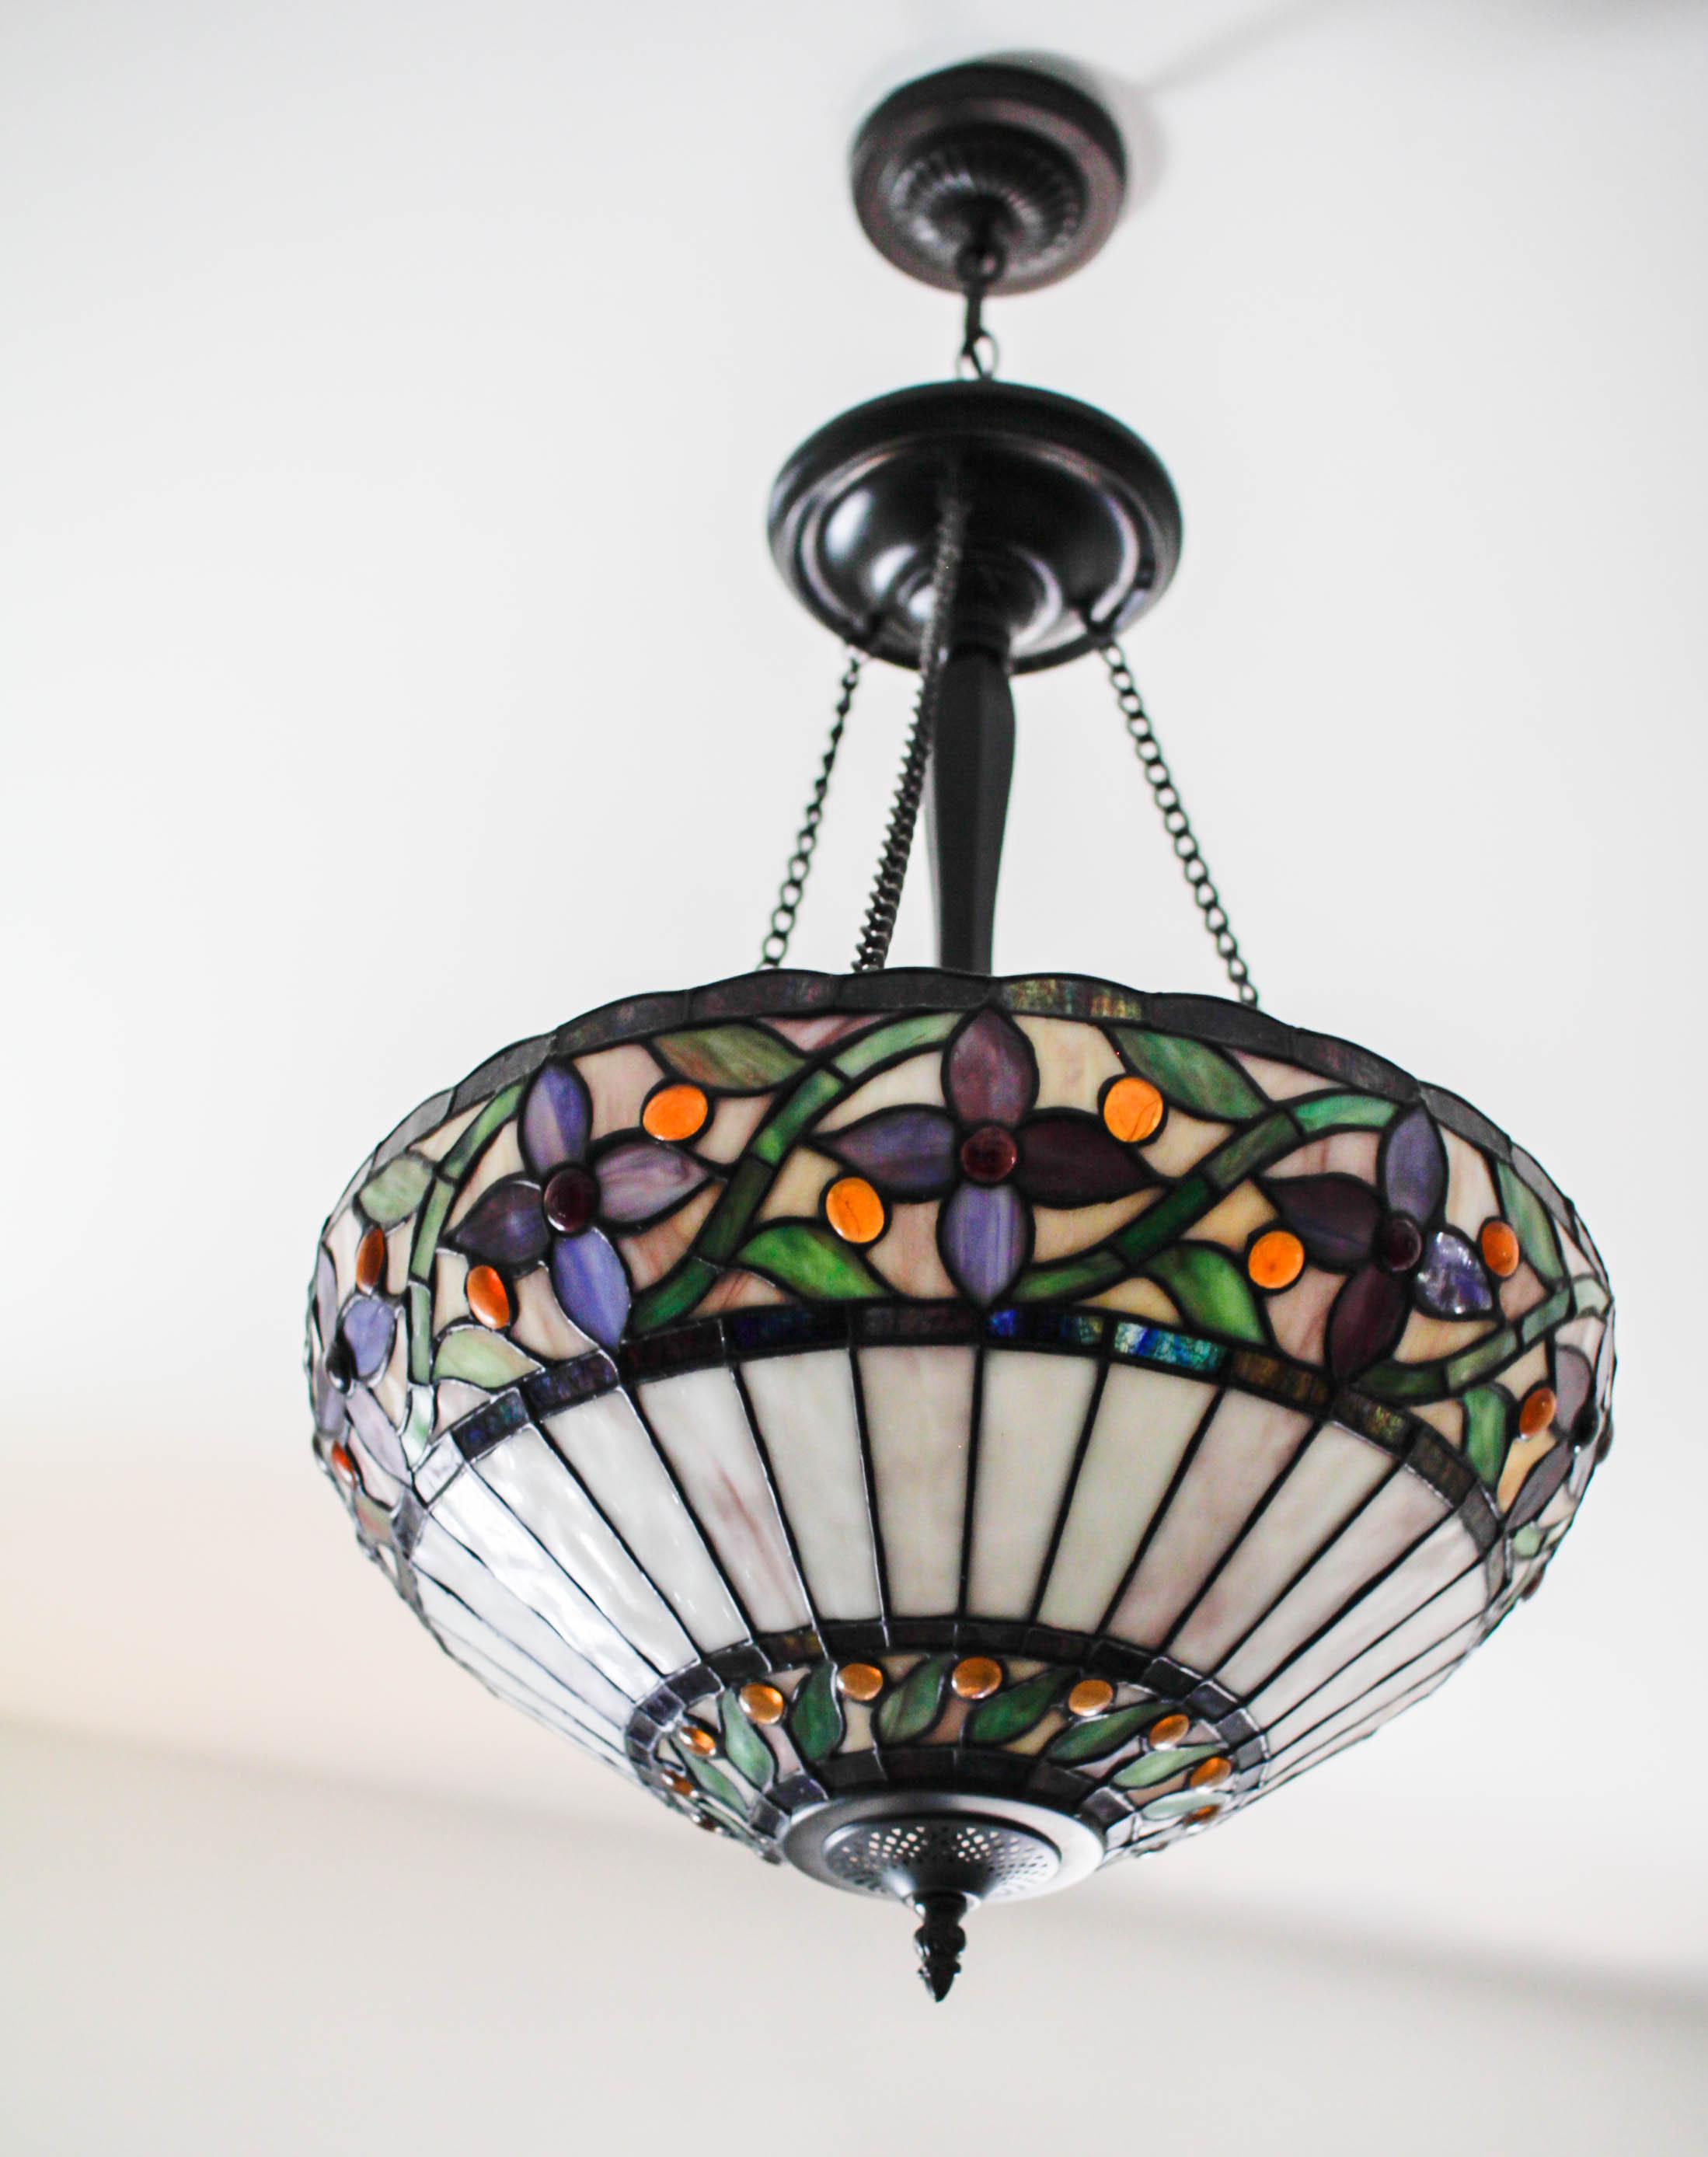 Antique Overhead Light